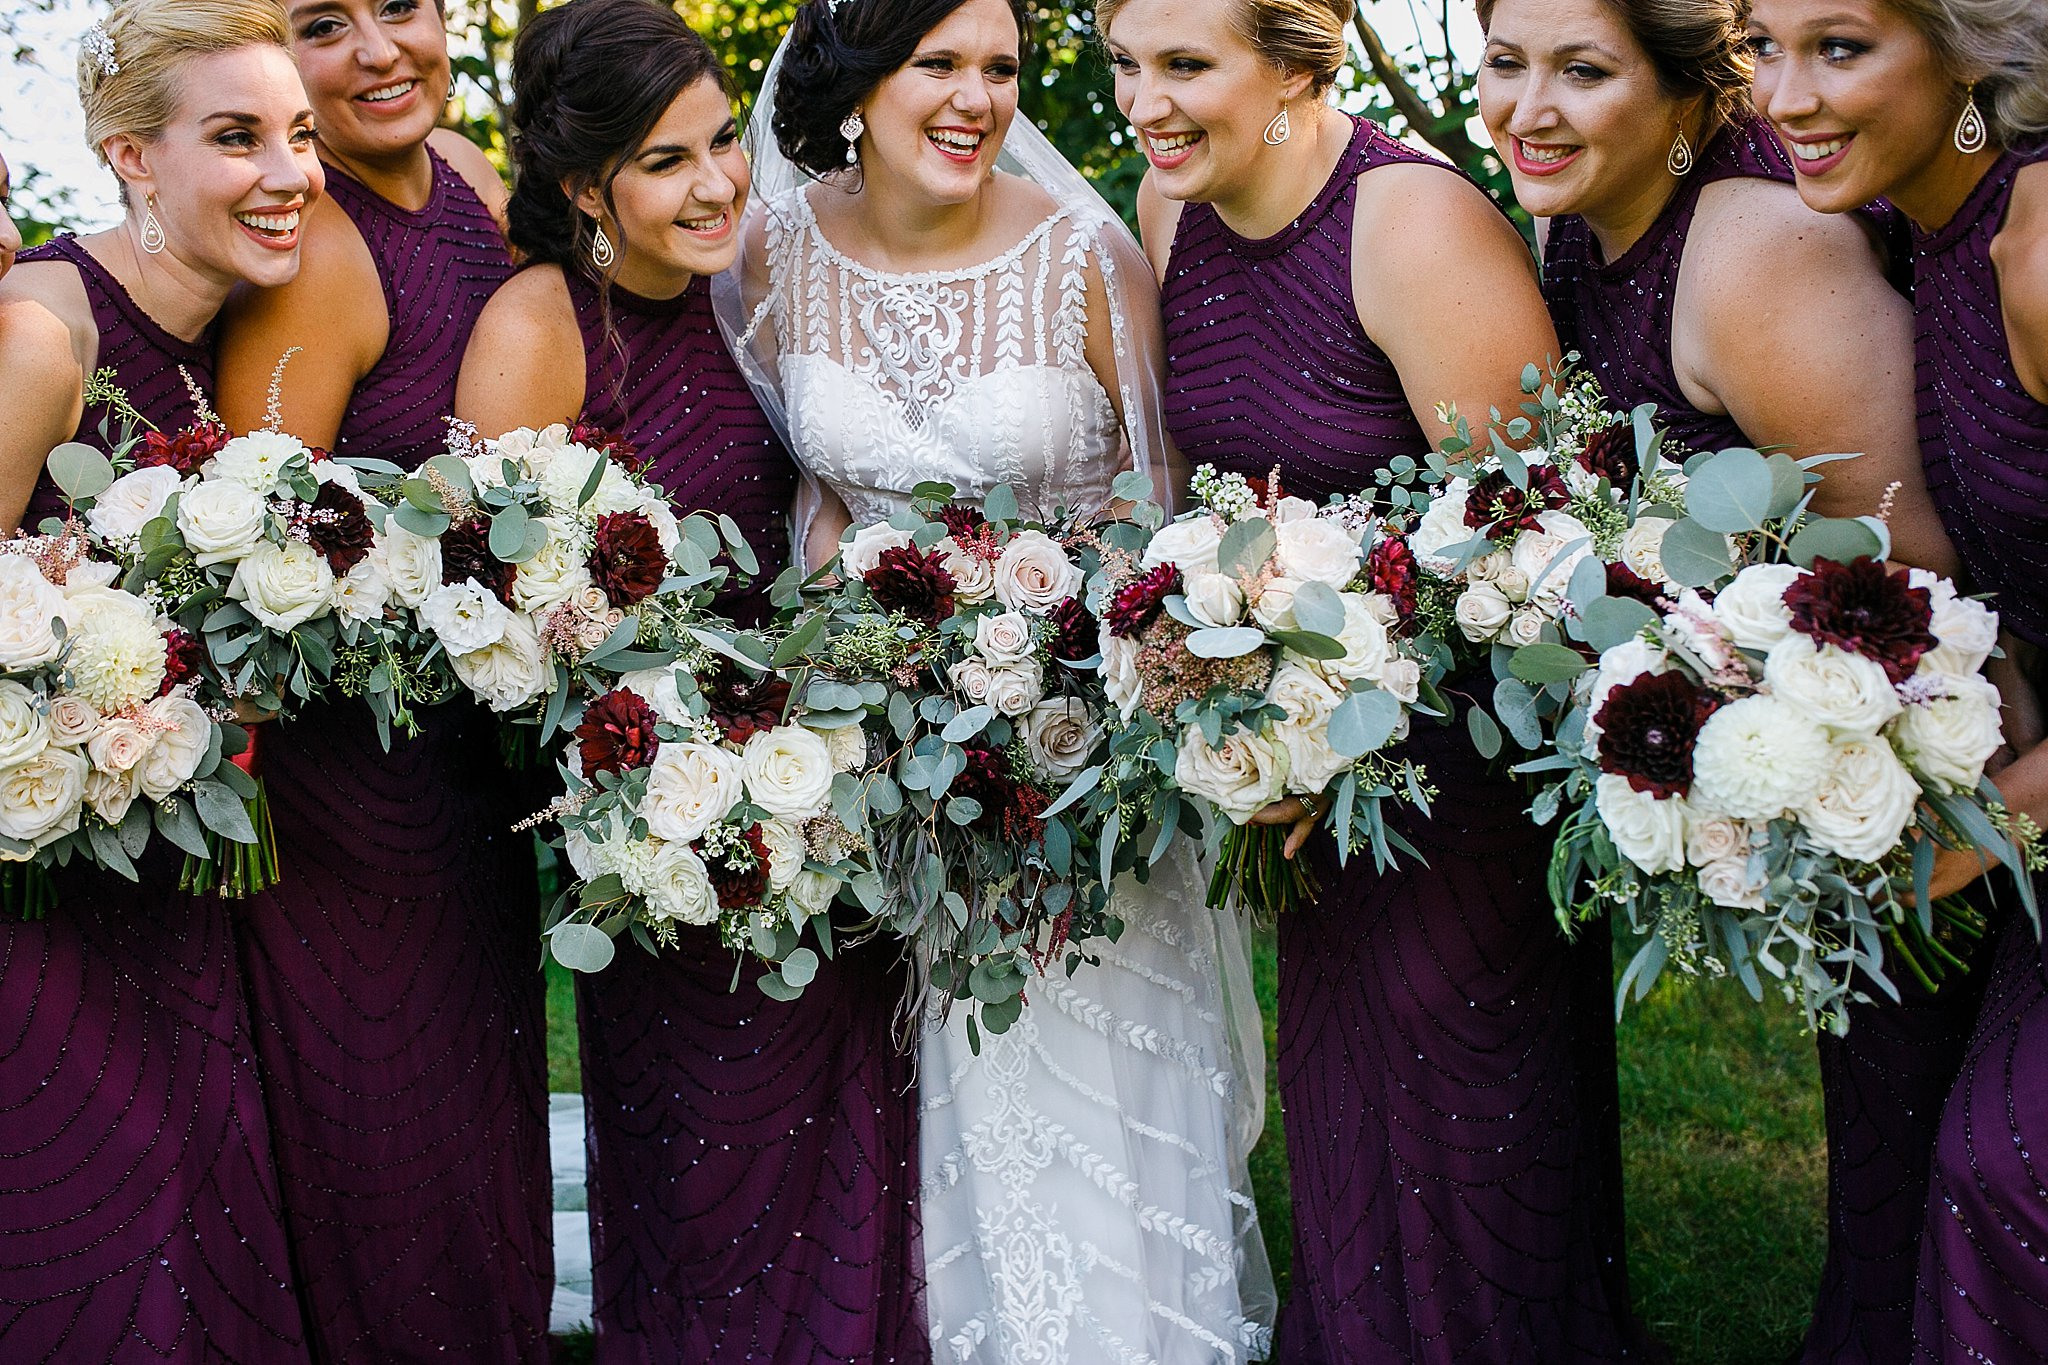 West Hills Country Club Wedding Gatsby Wedding Roaring Twenties Wedding Hudson Valley Wedding Photographer Sweet Alice Photography47.jpg